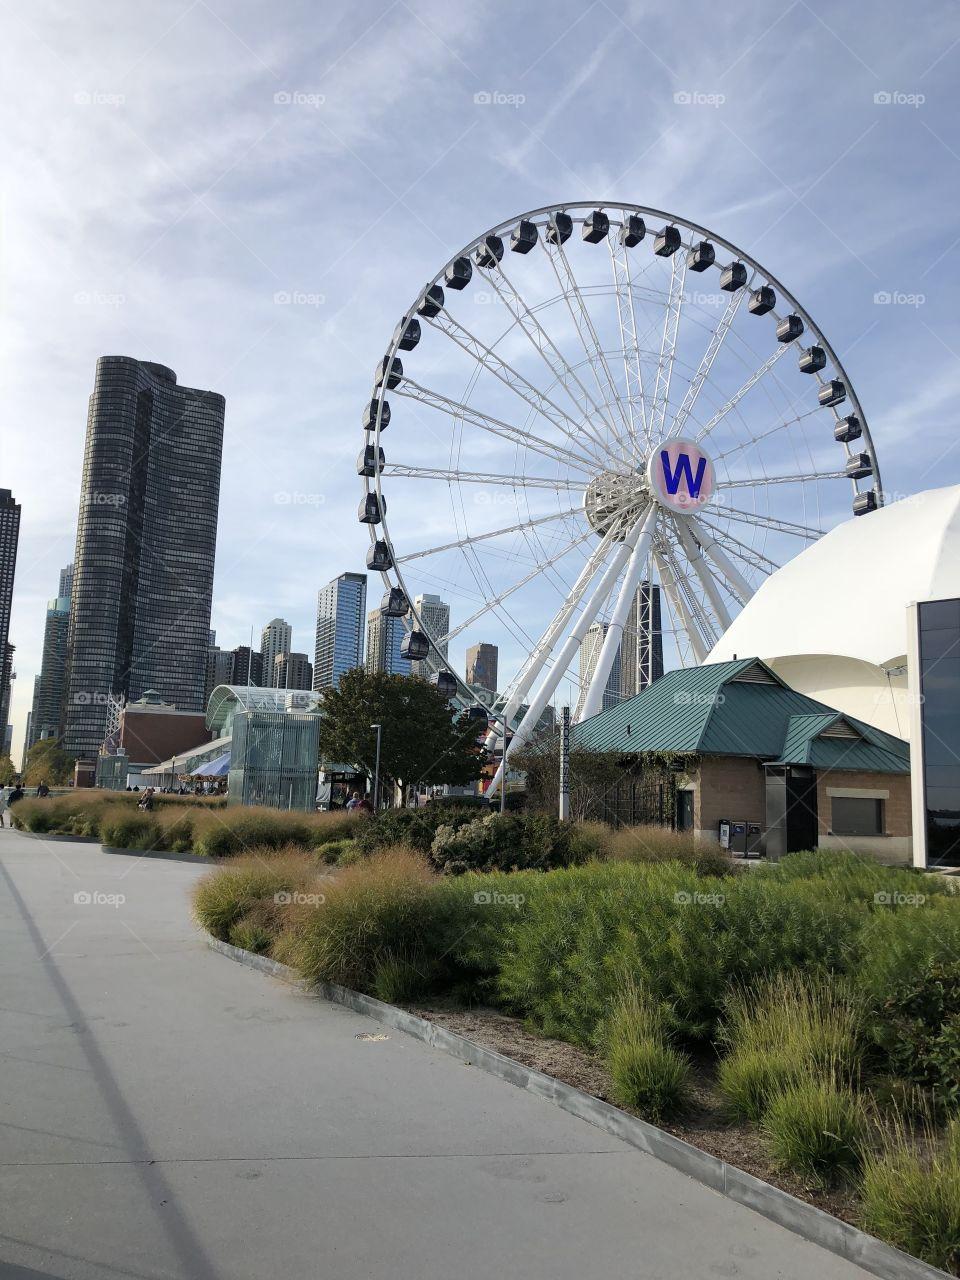 Chicago Pier Ferris wheel